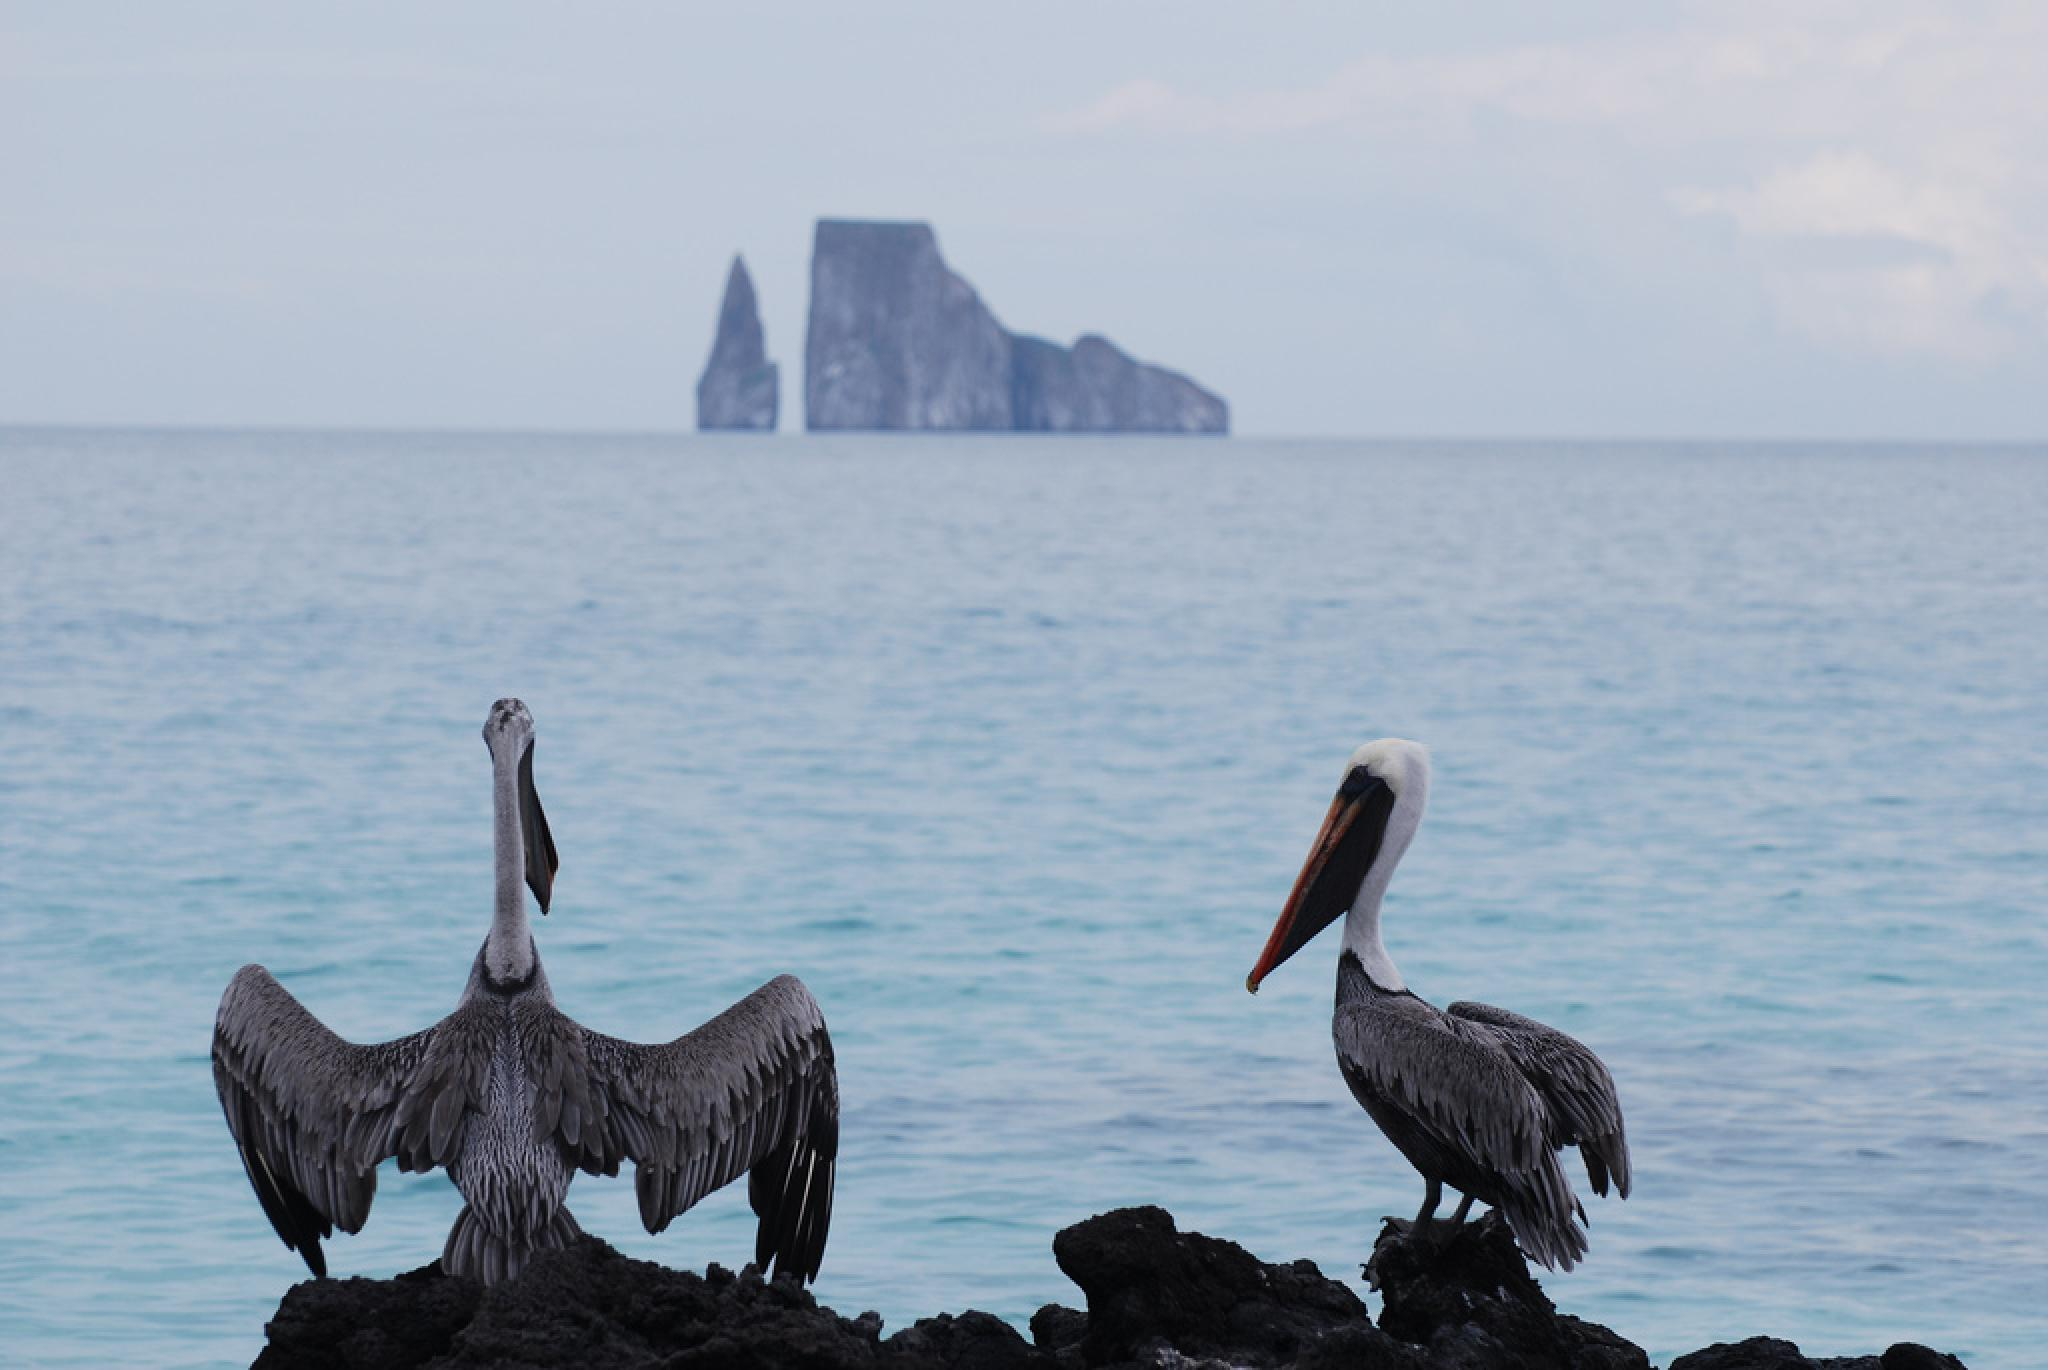 Kicker Rock - Leon Dormido Island Tour